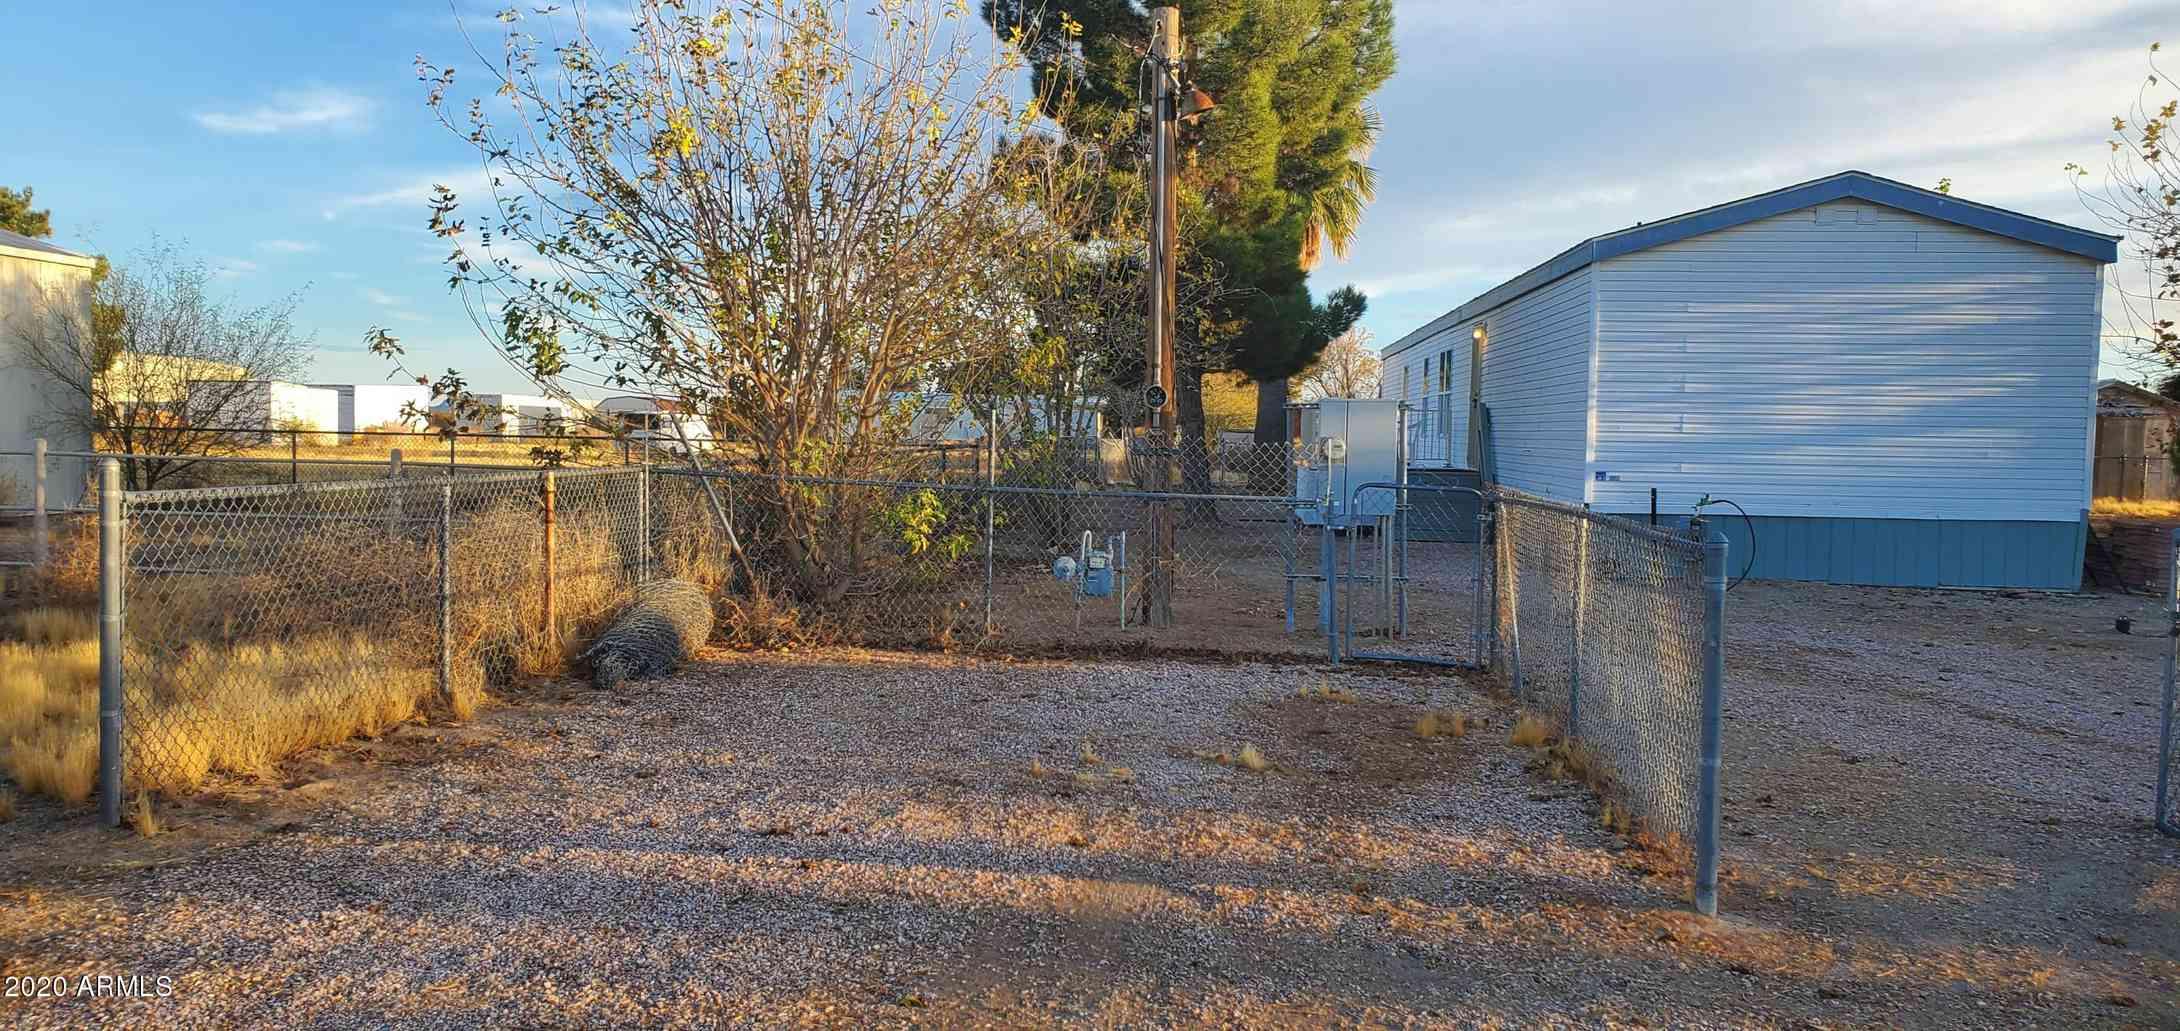 64698 HARCUVAR Drive, Salome, AZ, 85348,